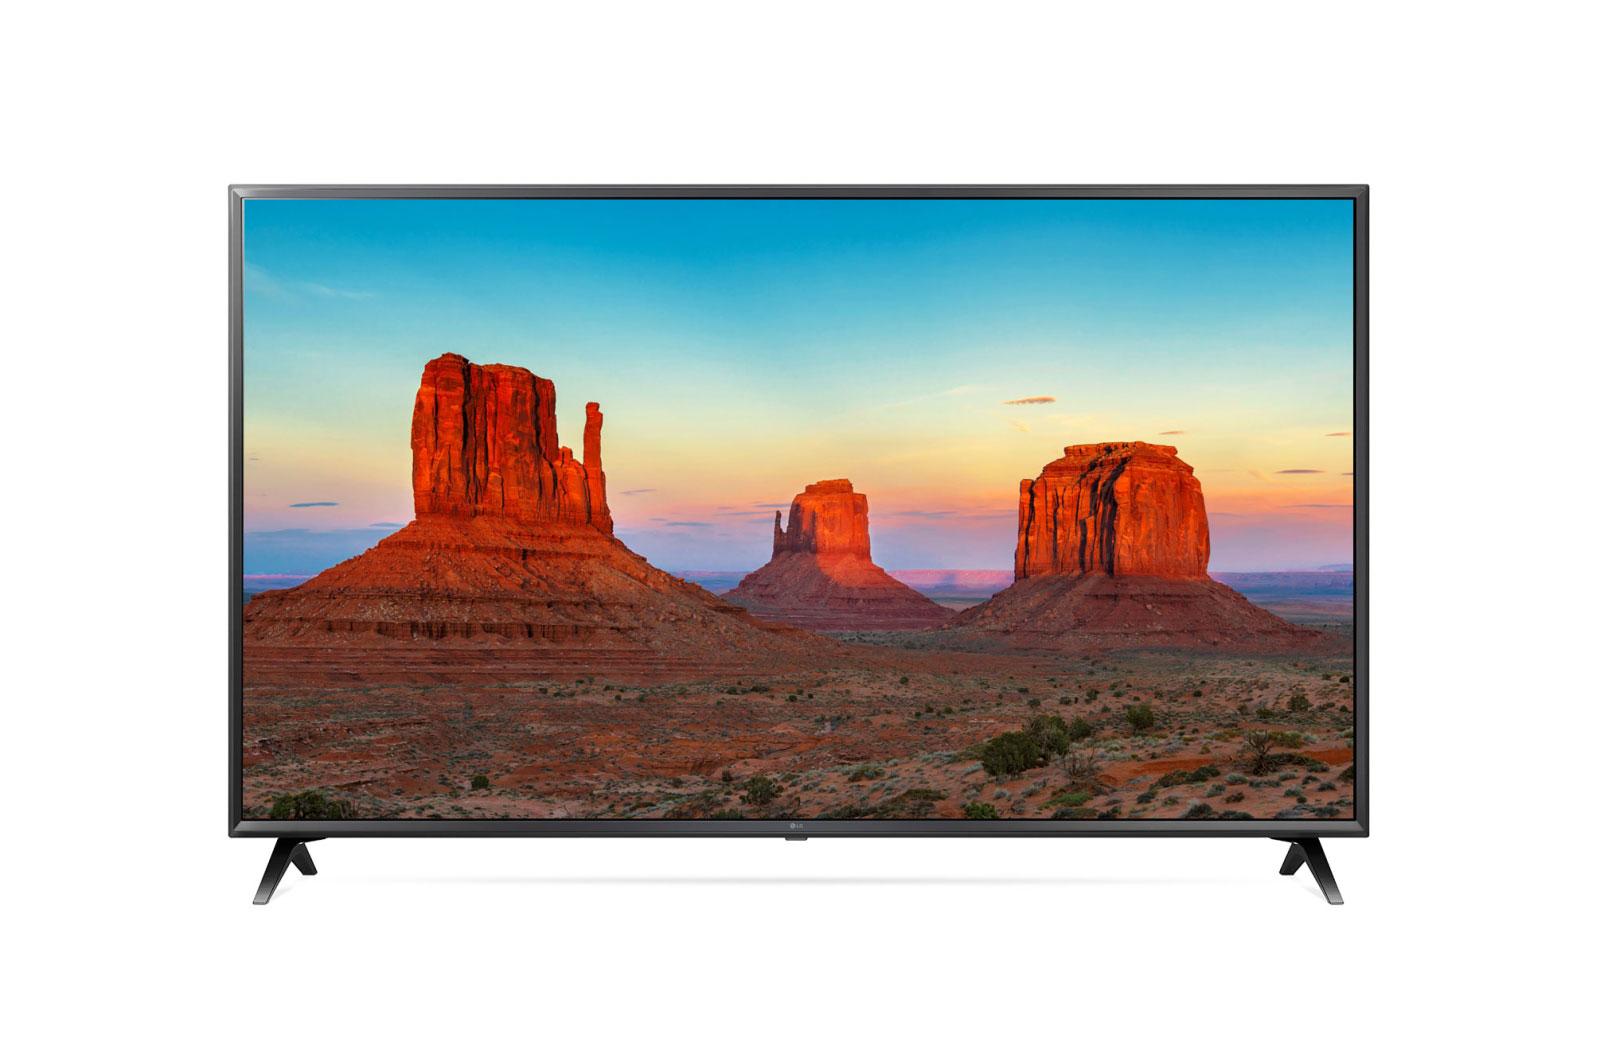 LG 55-Inch 4K UHD Smart LED TV 55UK6300PVB Black